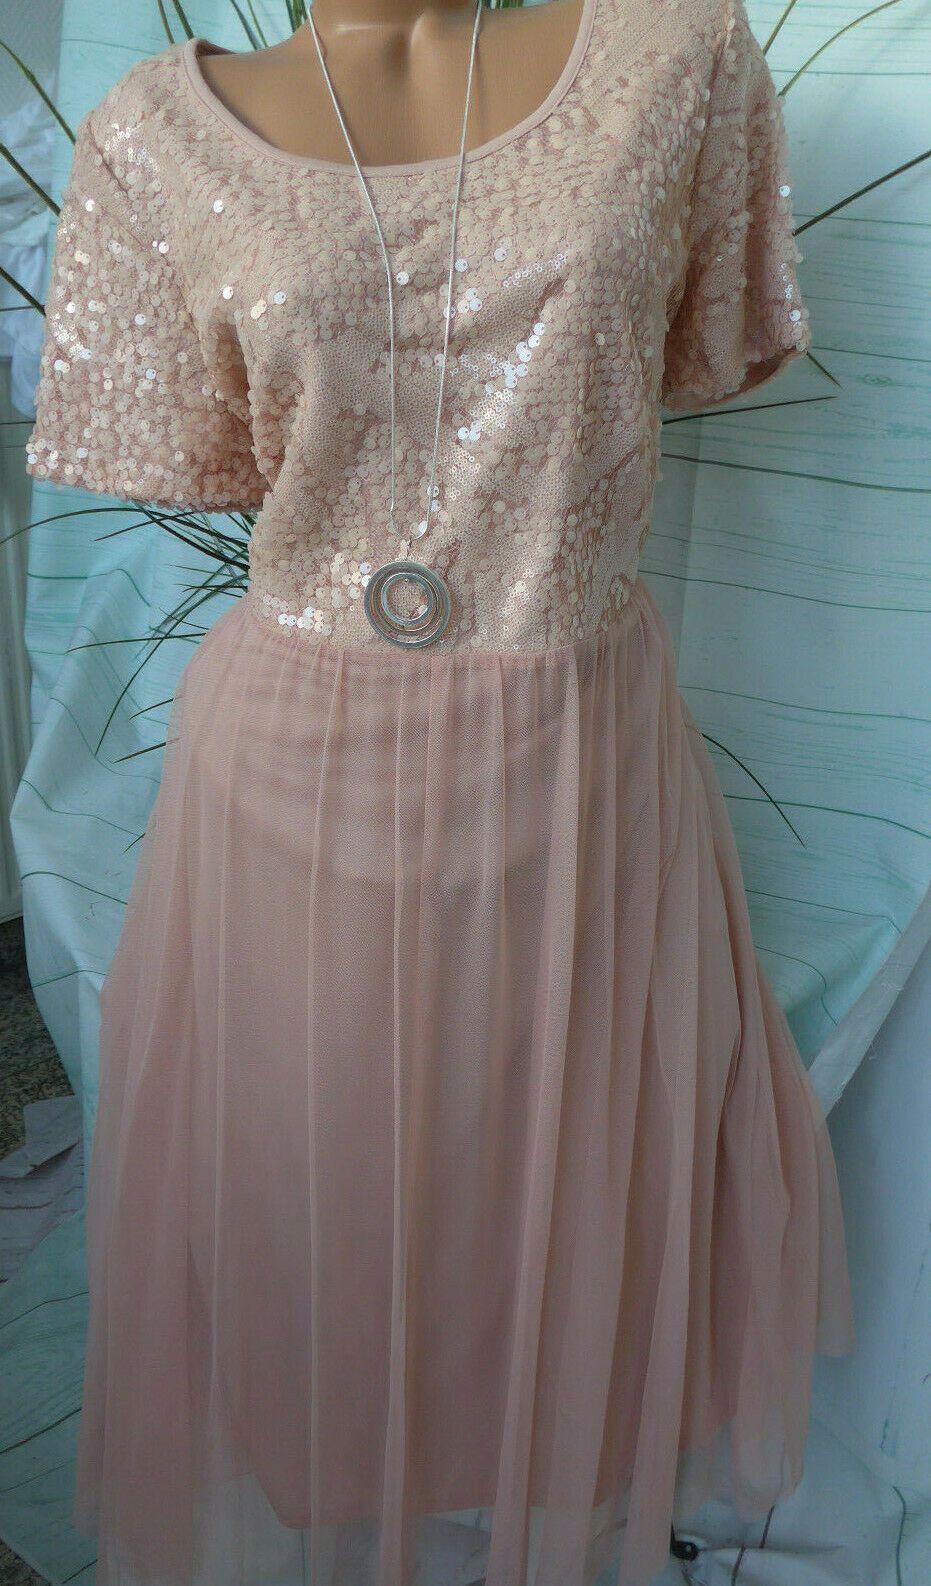 Sheego Eventkleid Abendkleid Kleid Gr. 16 bis 16 Rose mit